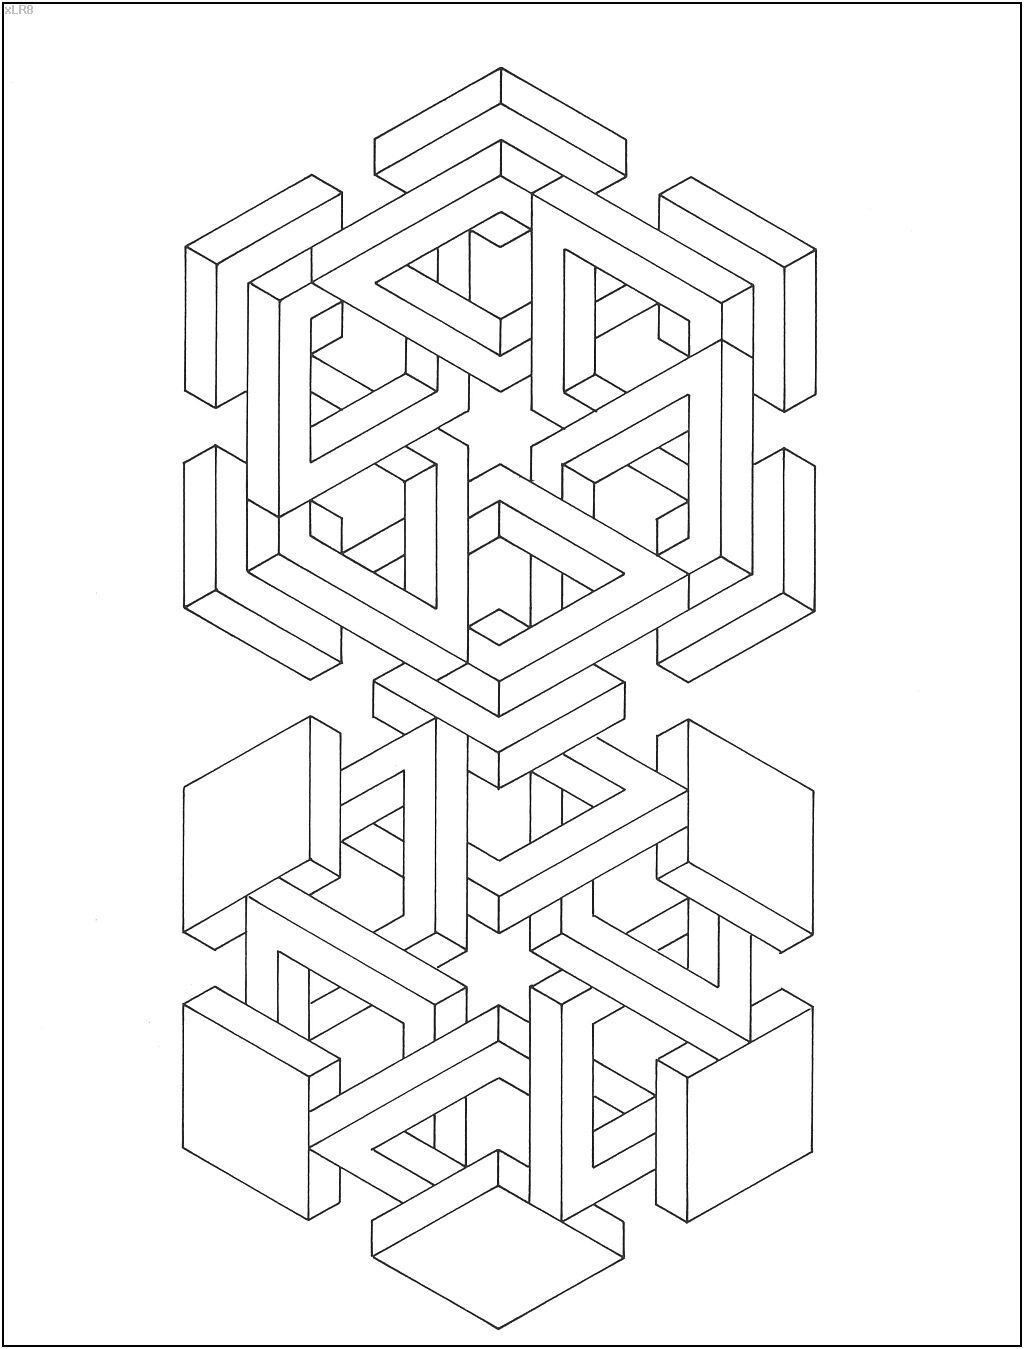 Koichi Sato. Optical illusion 28